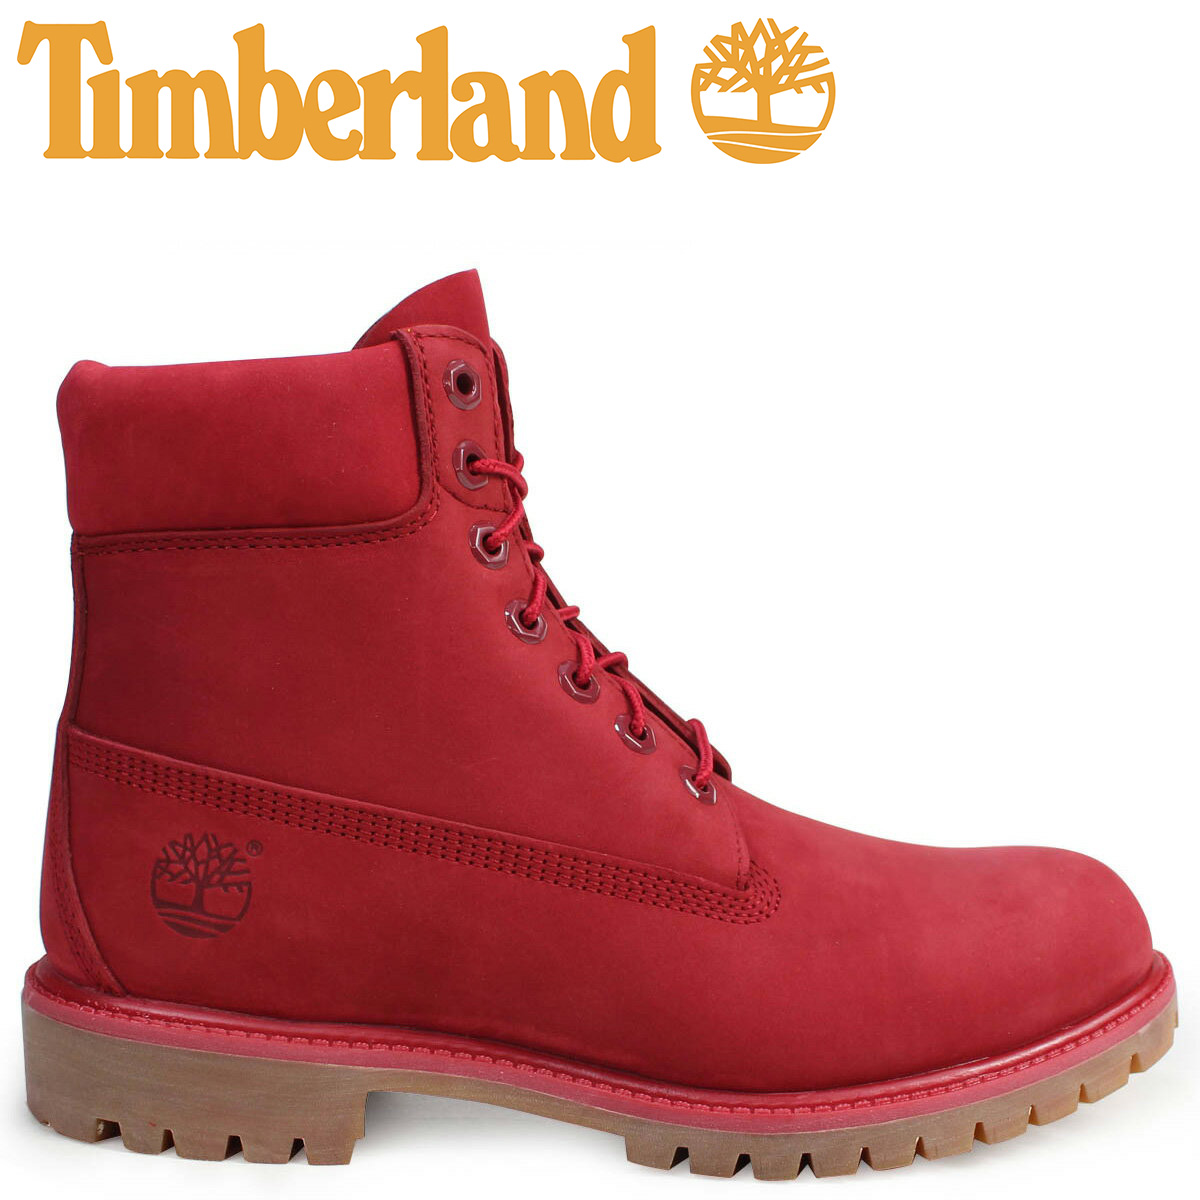 Timberland slip ons men TIMBERLAND AMHERST SLIP ON A15LW BONE BROWN Vaughn brown